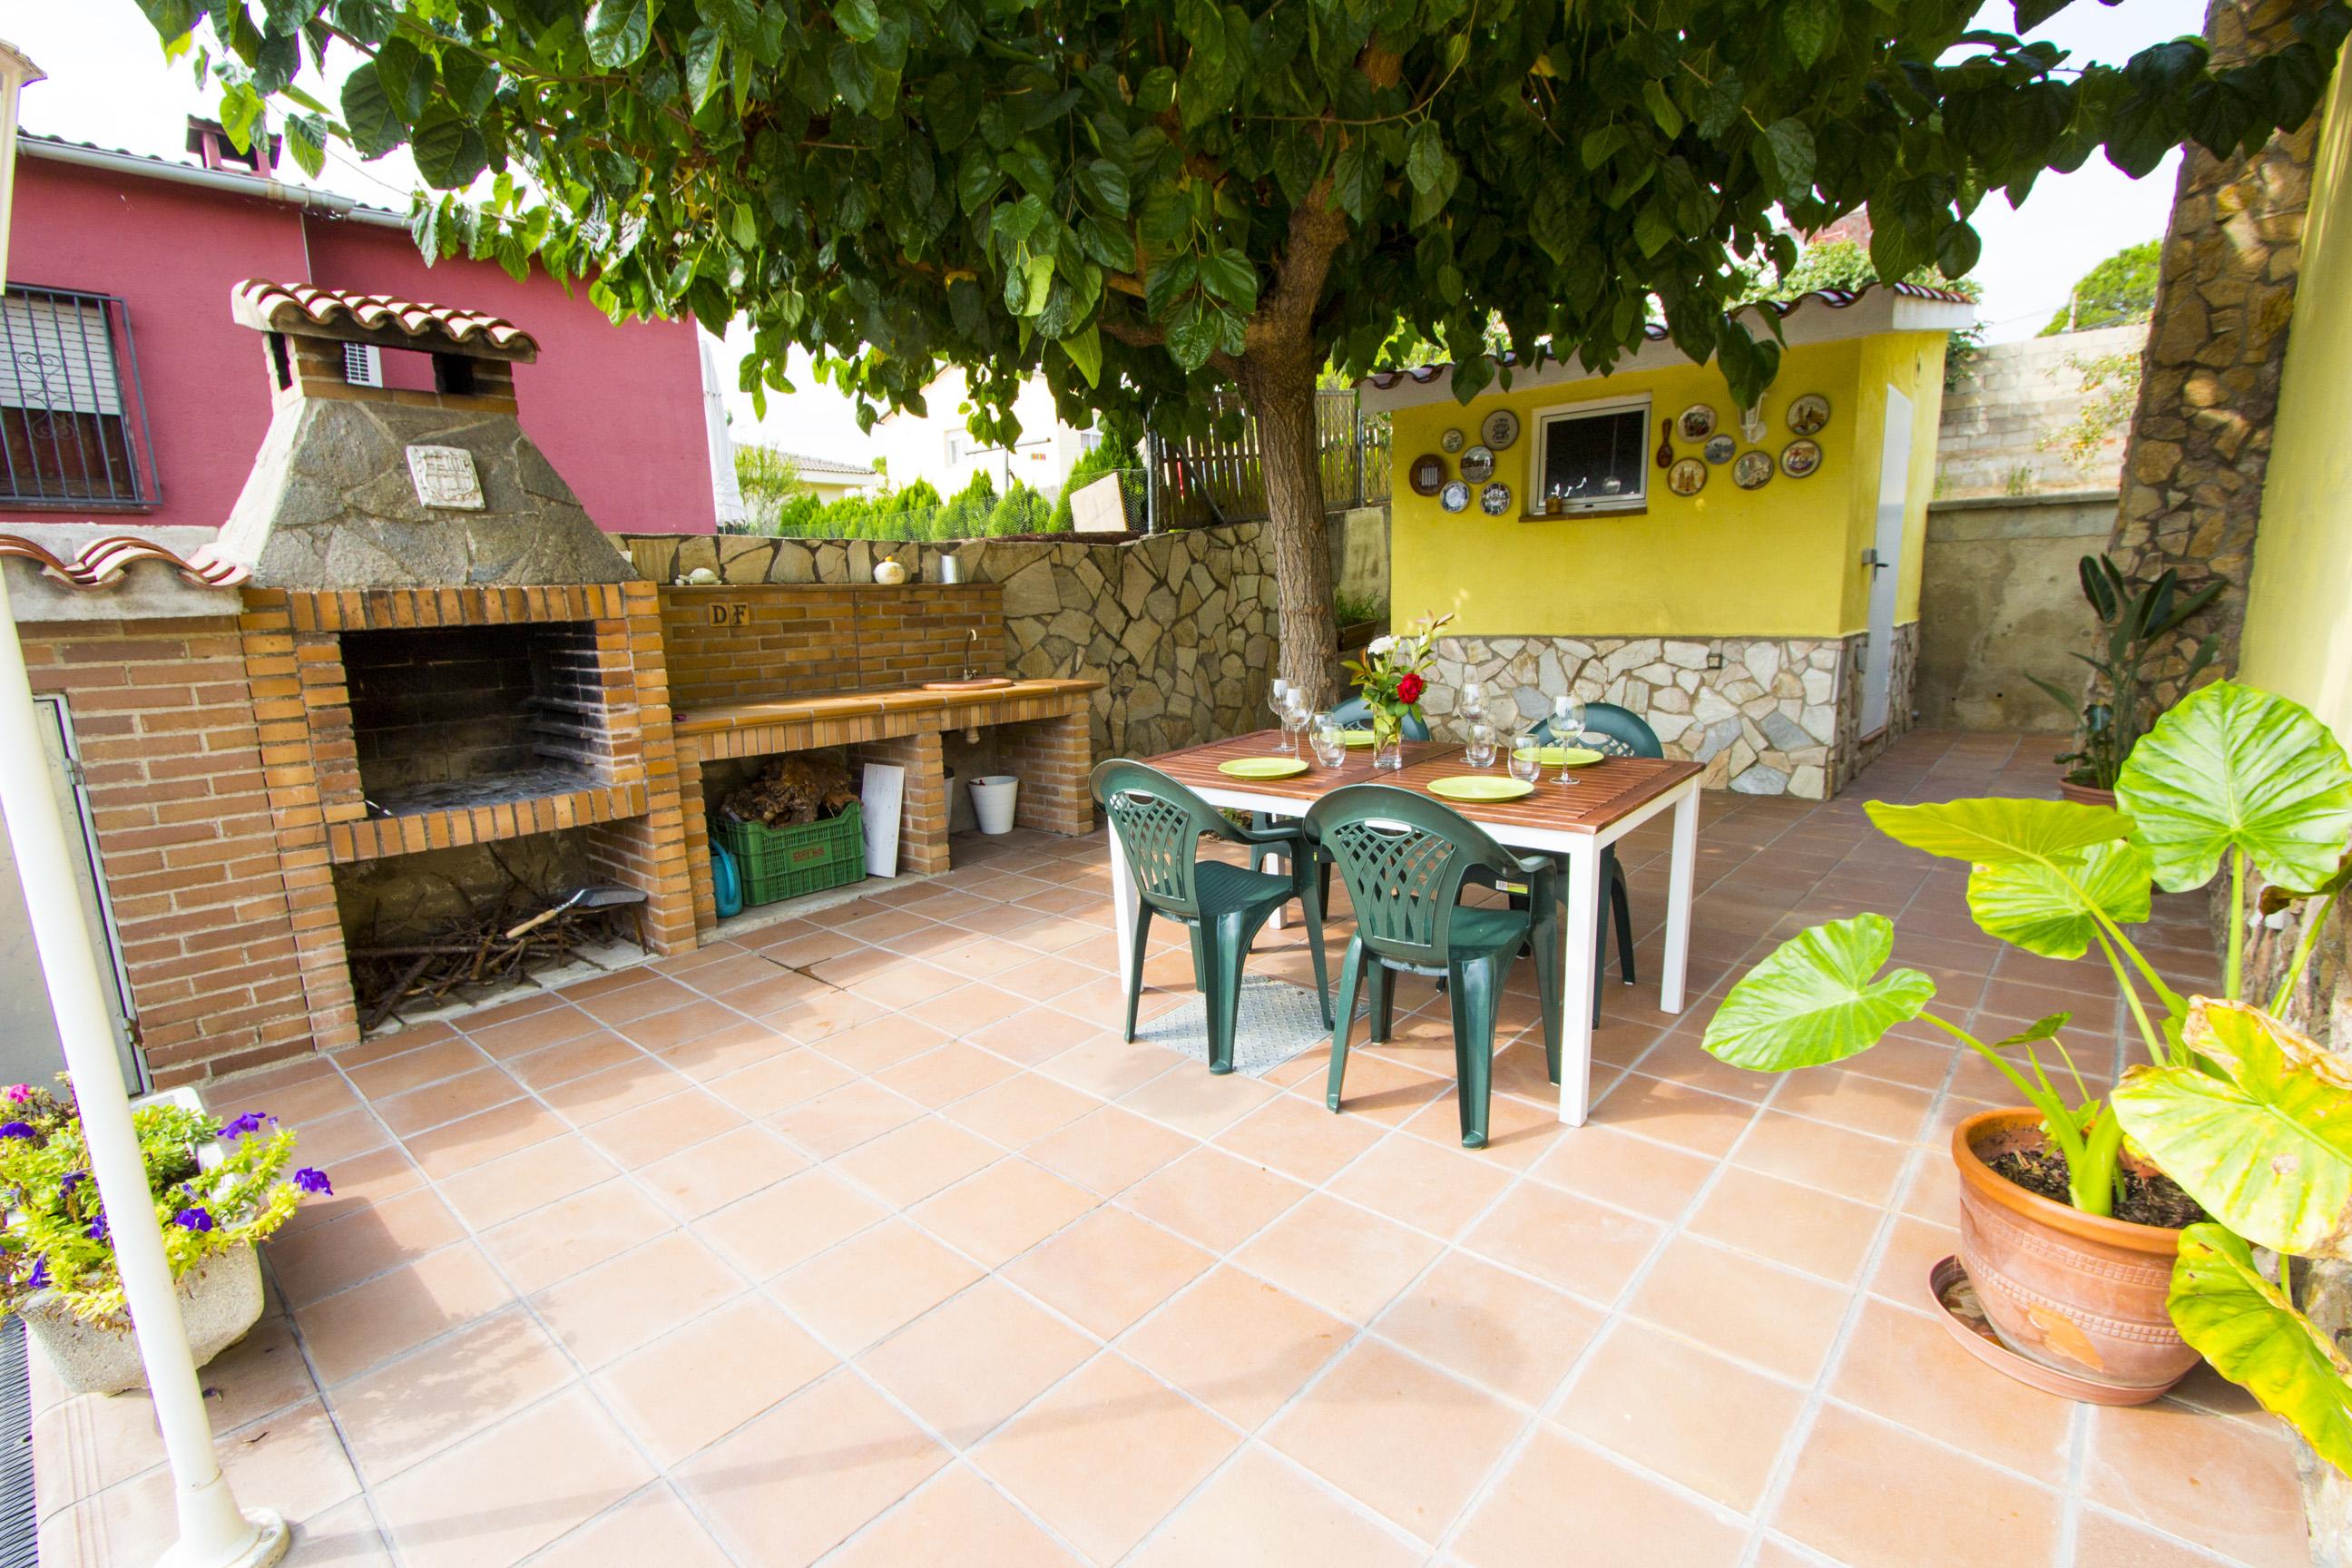 Ferienhaus Catalunya Casas: Peaceful Villa Sils, just 20 km from Costa Brava beaches! (2302155), Les Mallorquines, Girona, Katalonien, Spanien, Bild 8